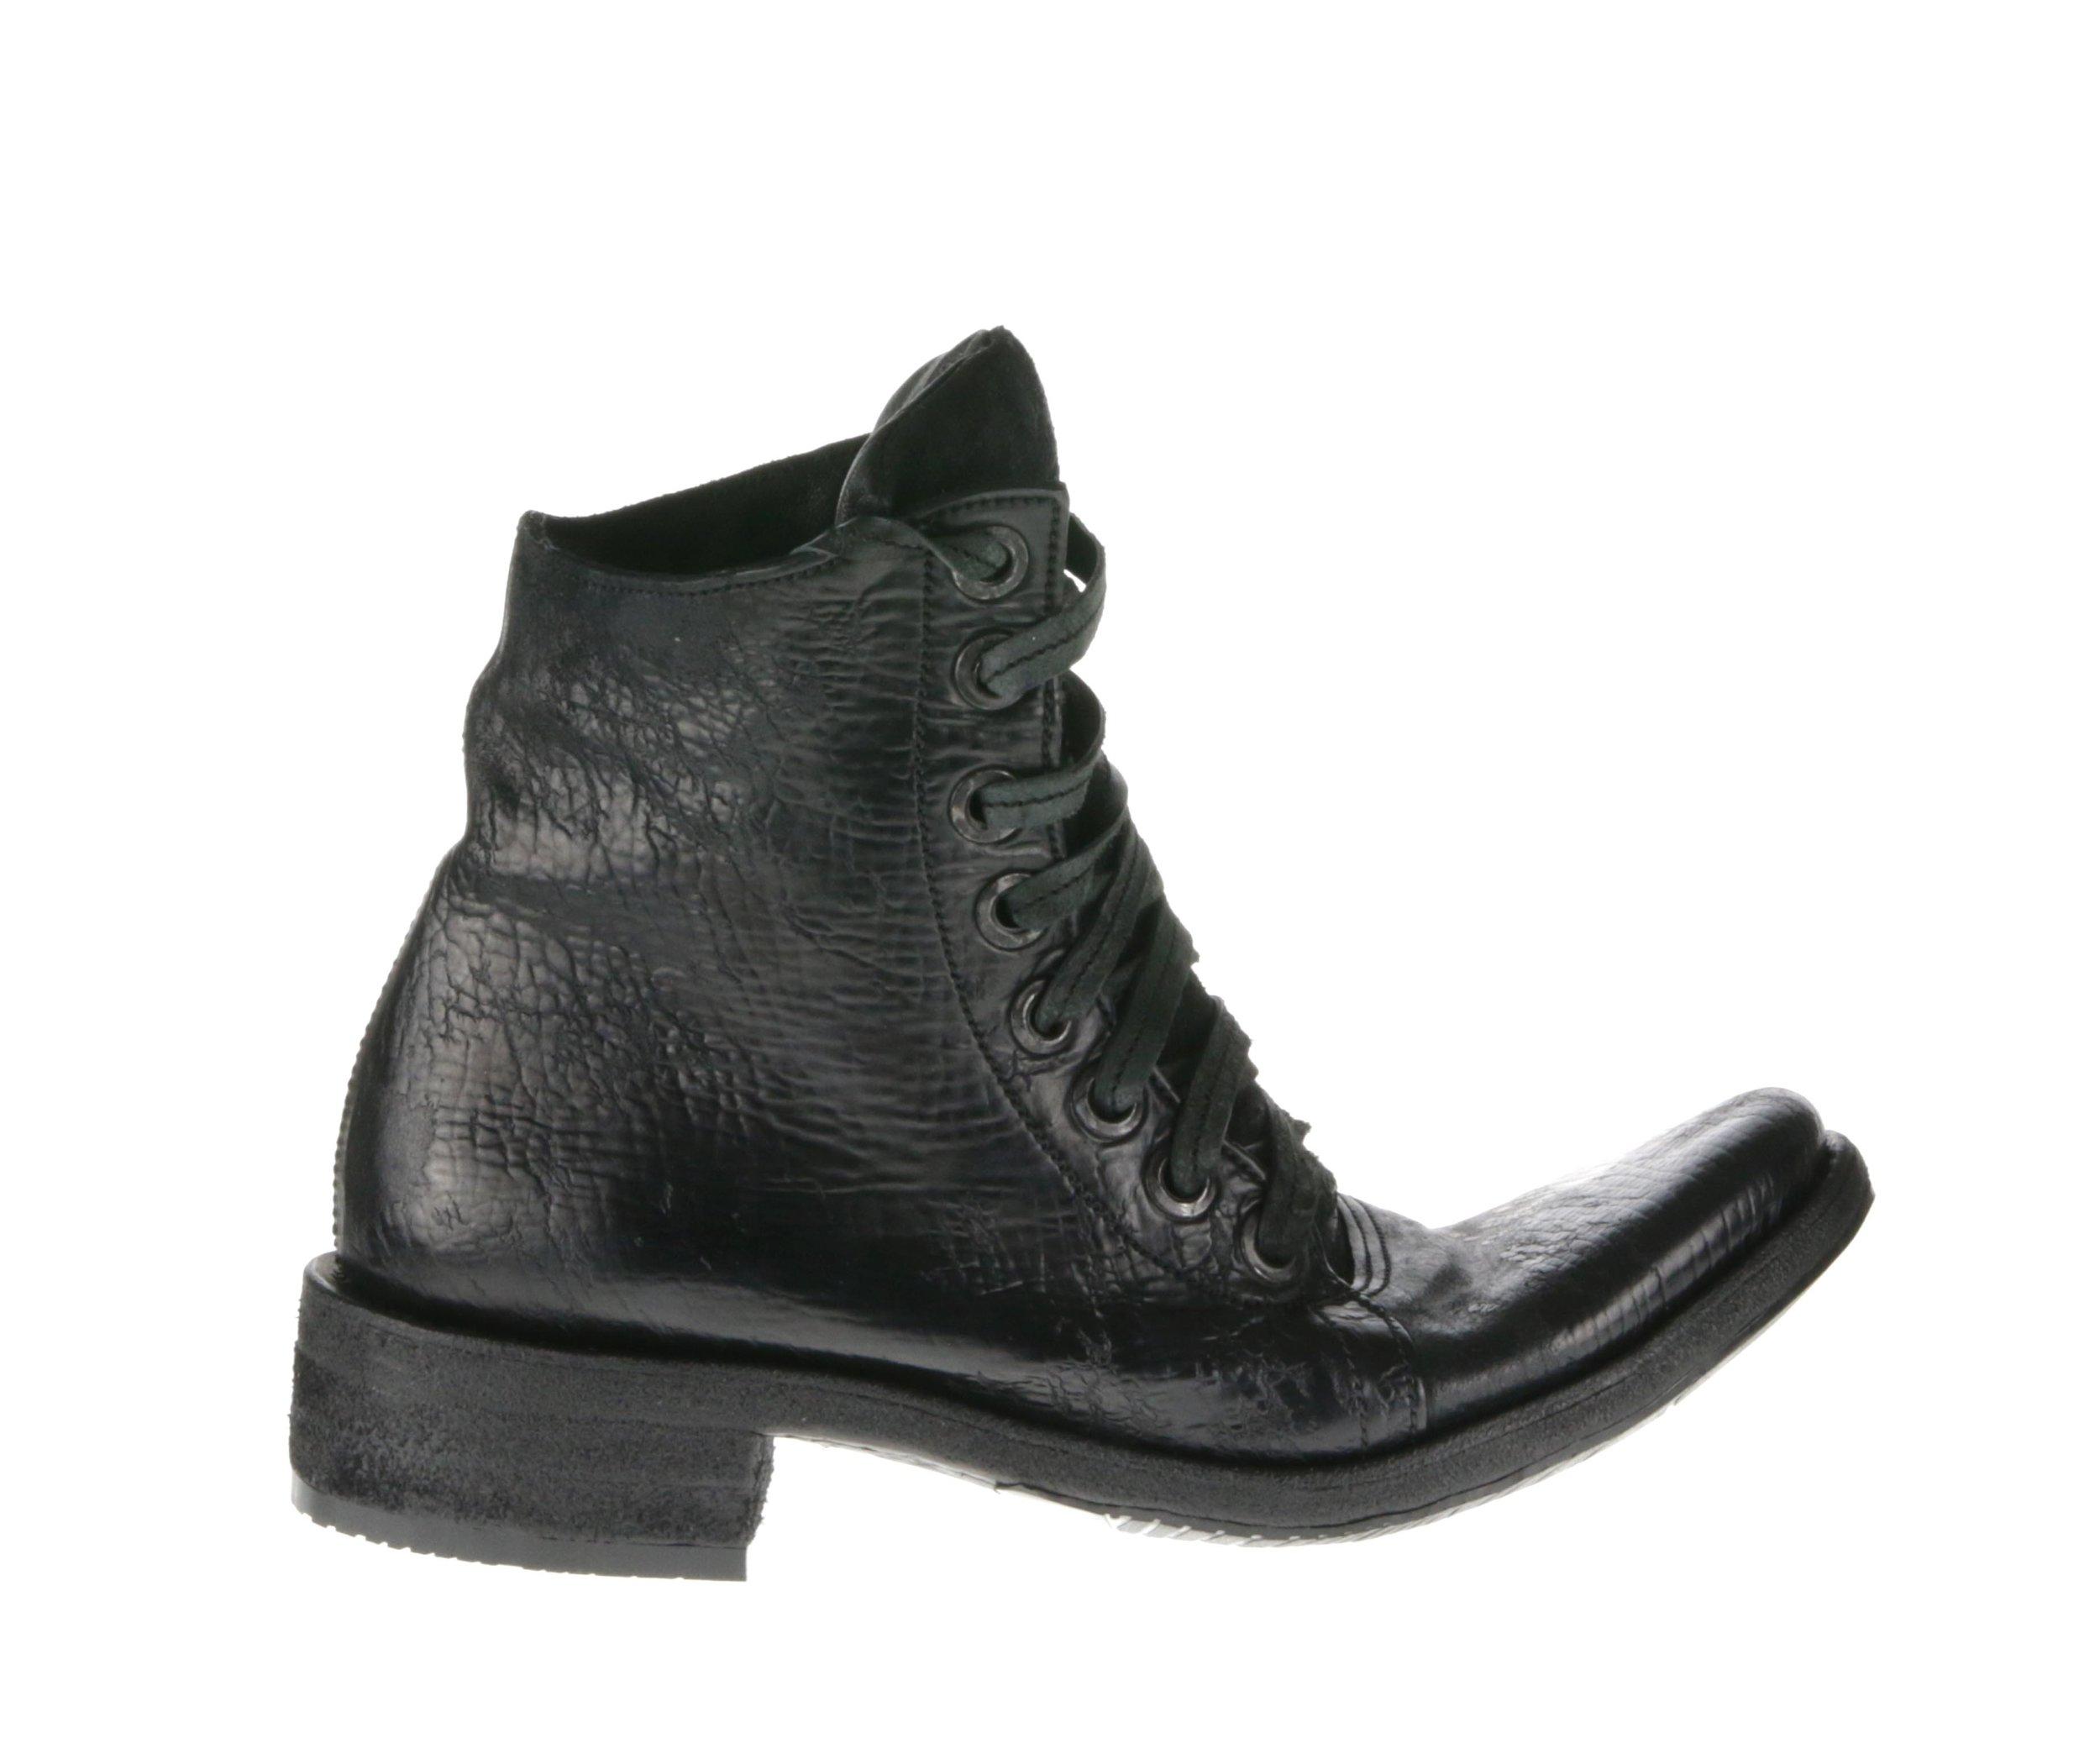 8Hole Boots Black Culatta Outside.jpg